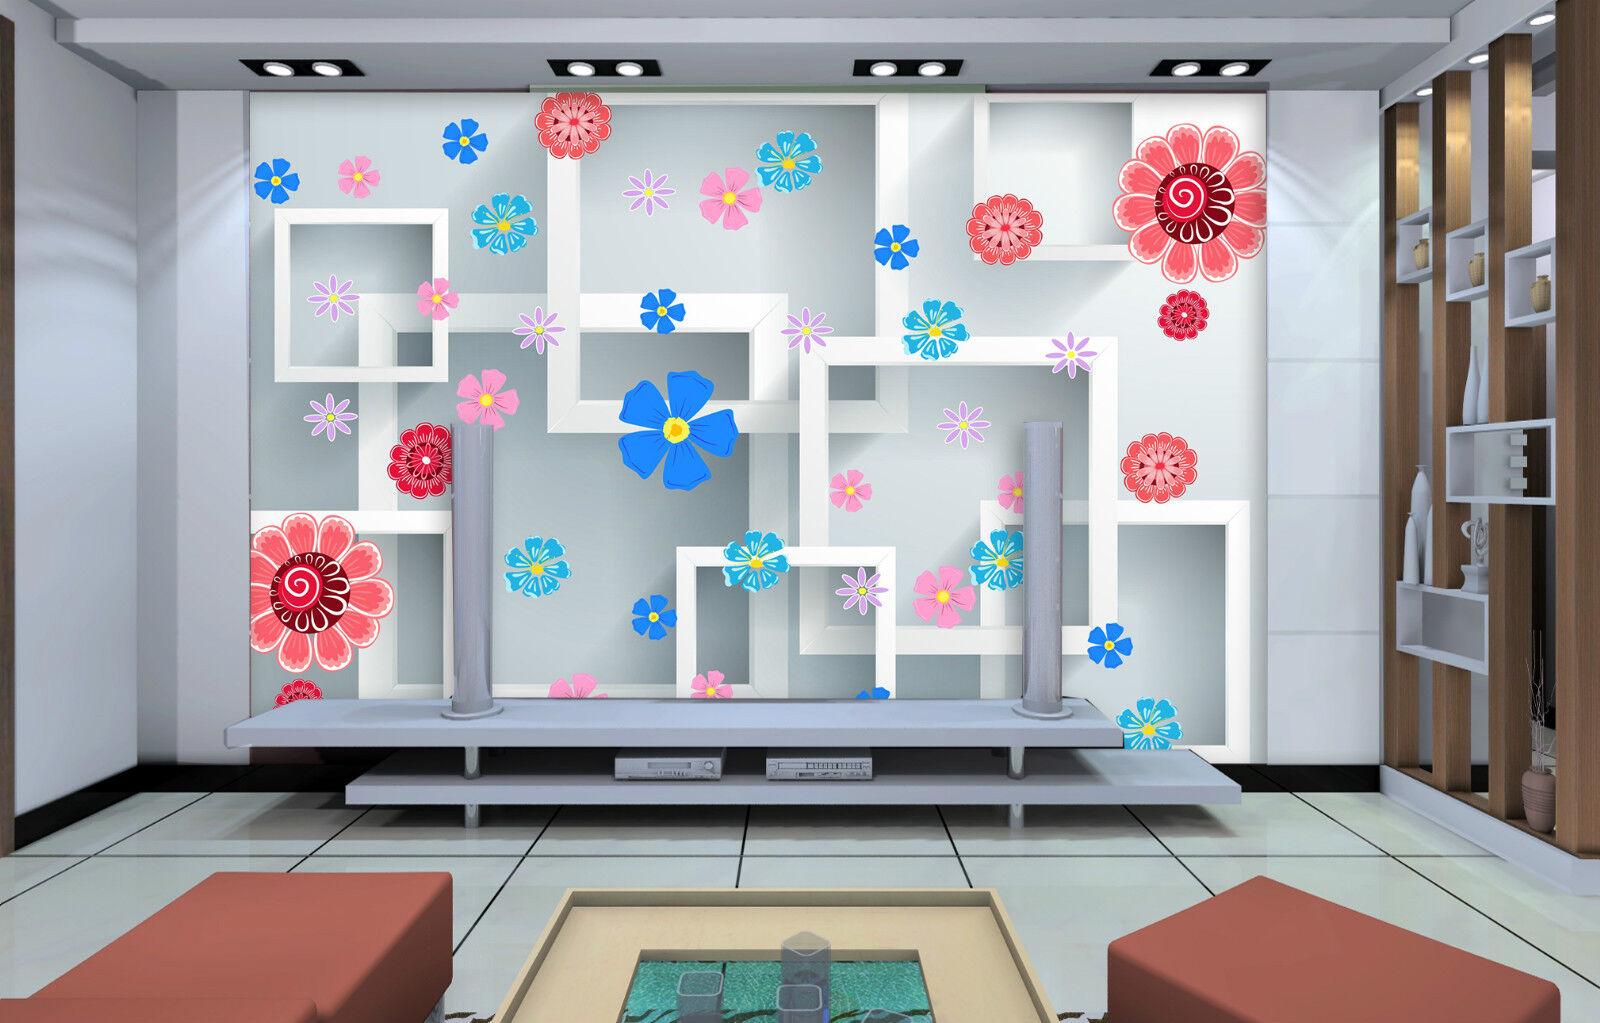 3D Carta Fiore Fiore Fiore 36 Parete Murale Foto Carta da parati immagine sfondo muro stampa 0a5deb